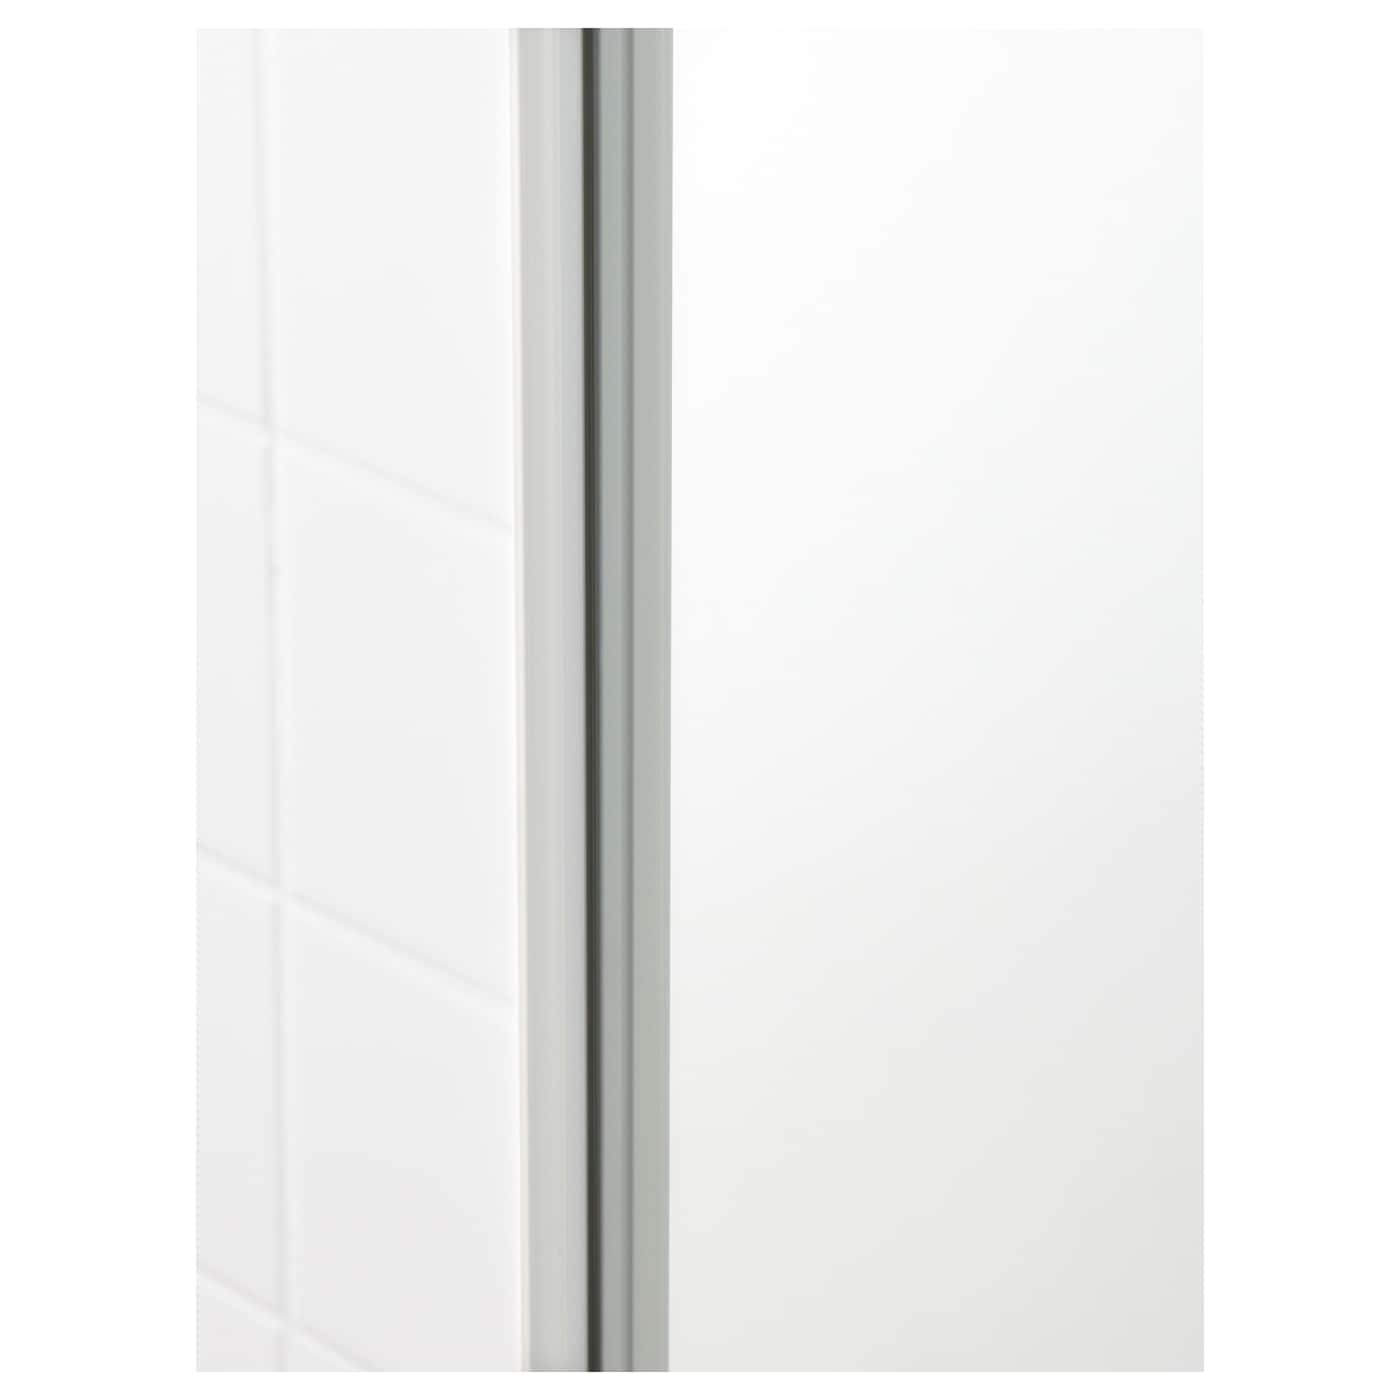 godmorgon hoge kast met spiegeldeur hoogglans wit 40 x 32 x 192 cm ikea. Black Bedroom Furniture Sets. Home Design Ideas